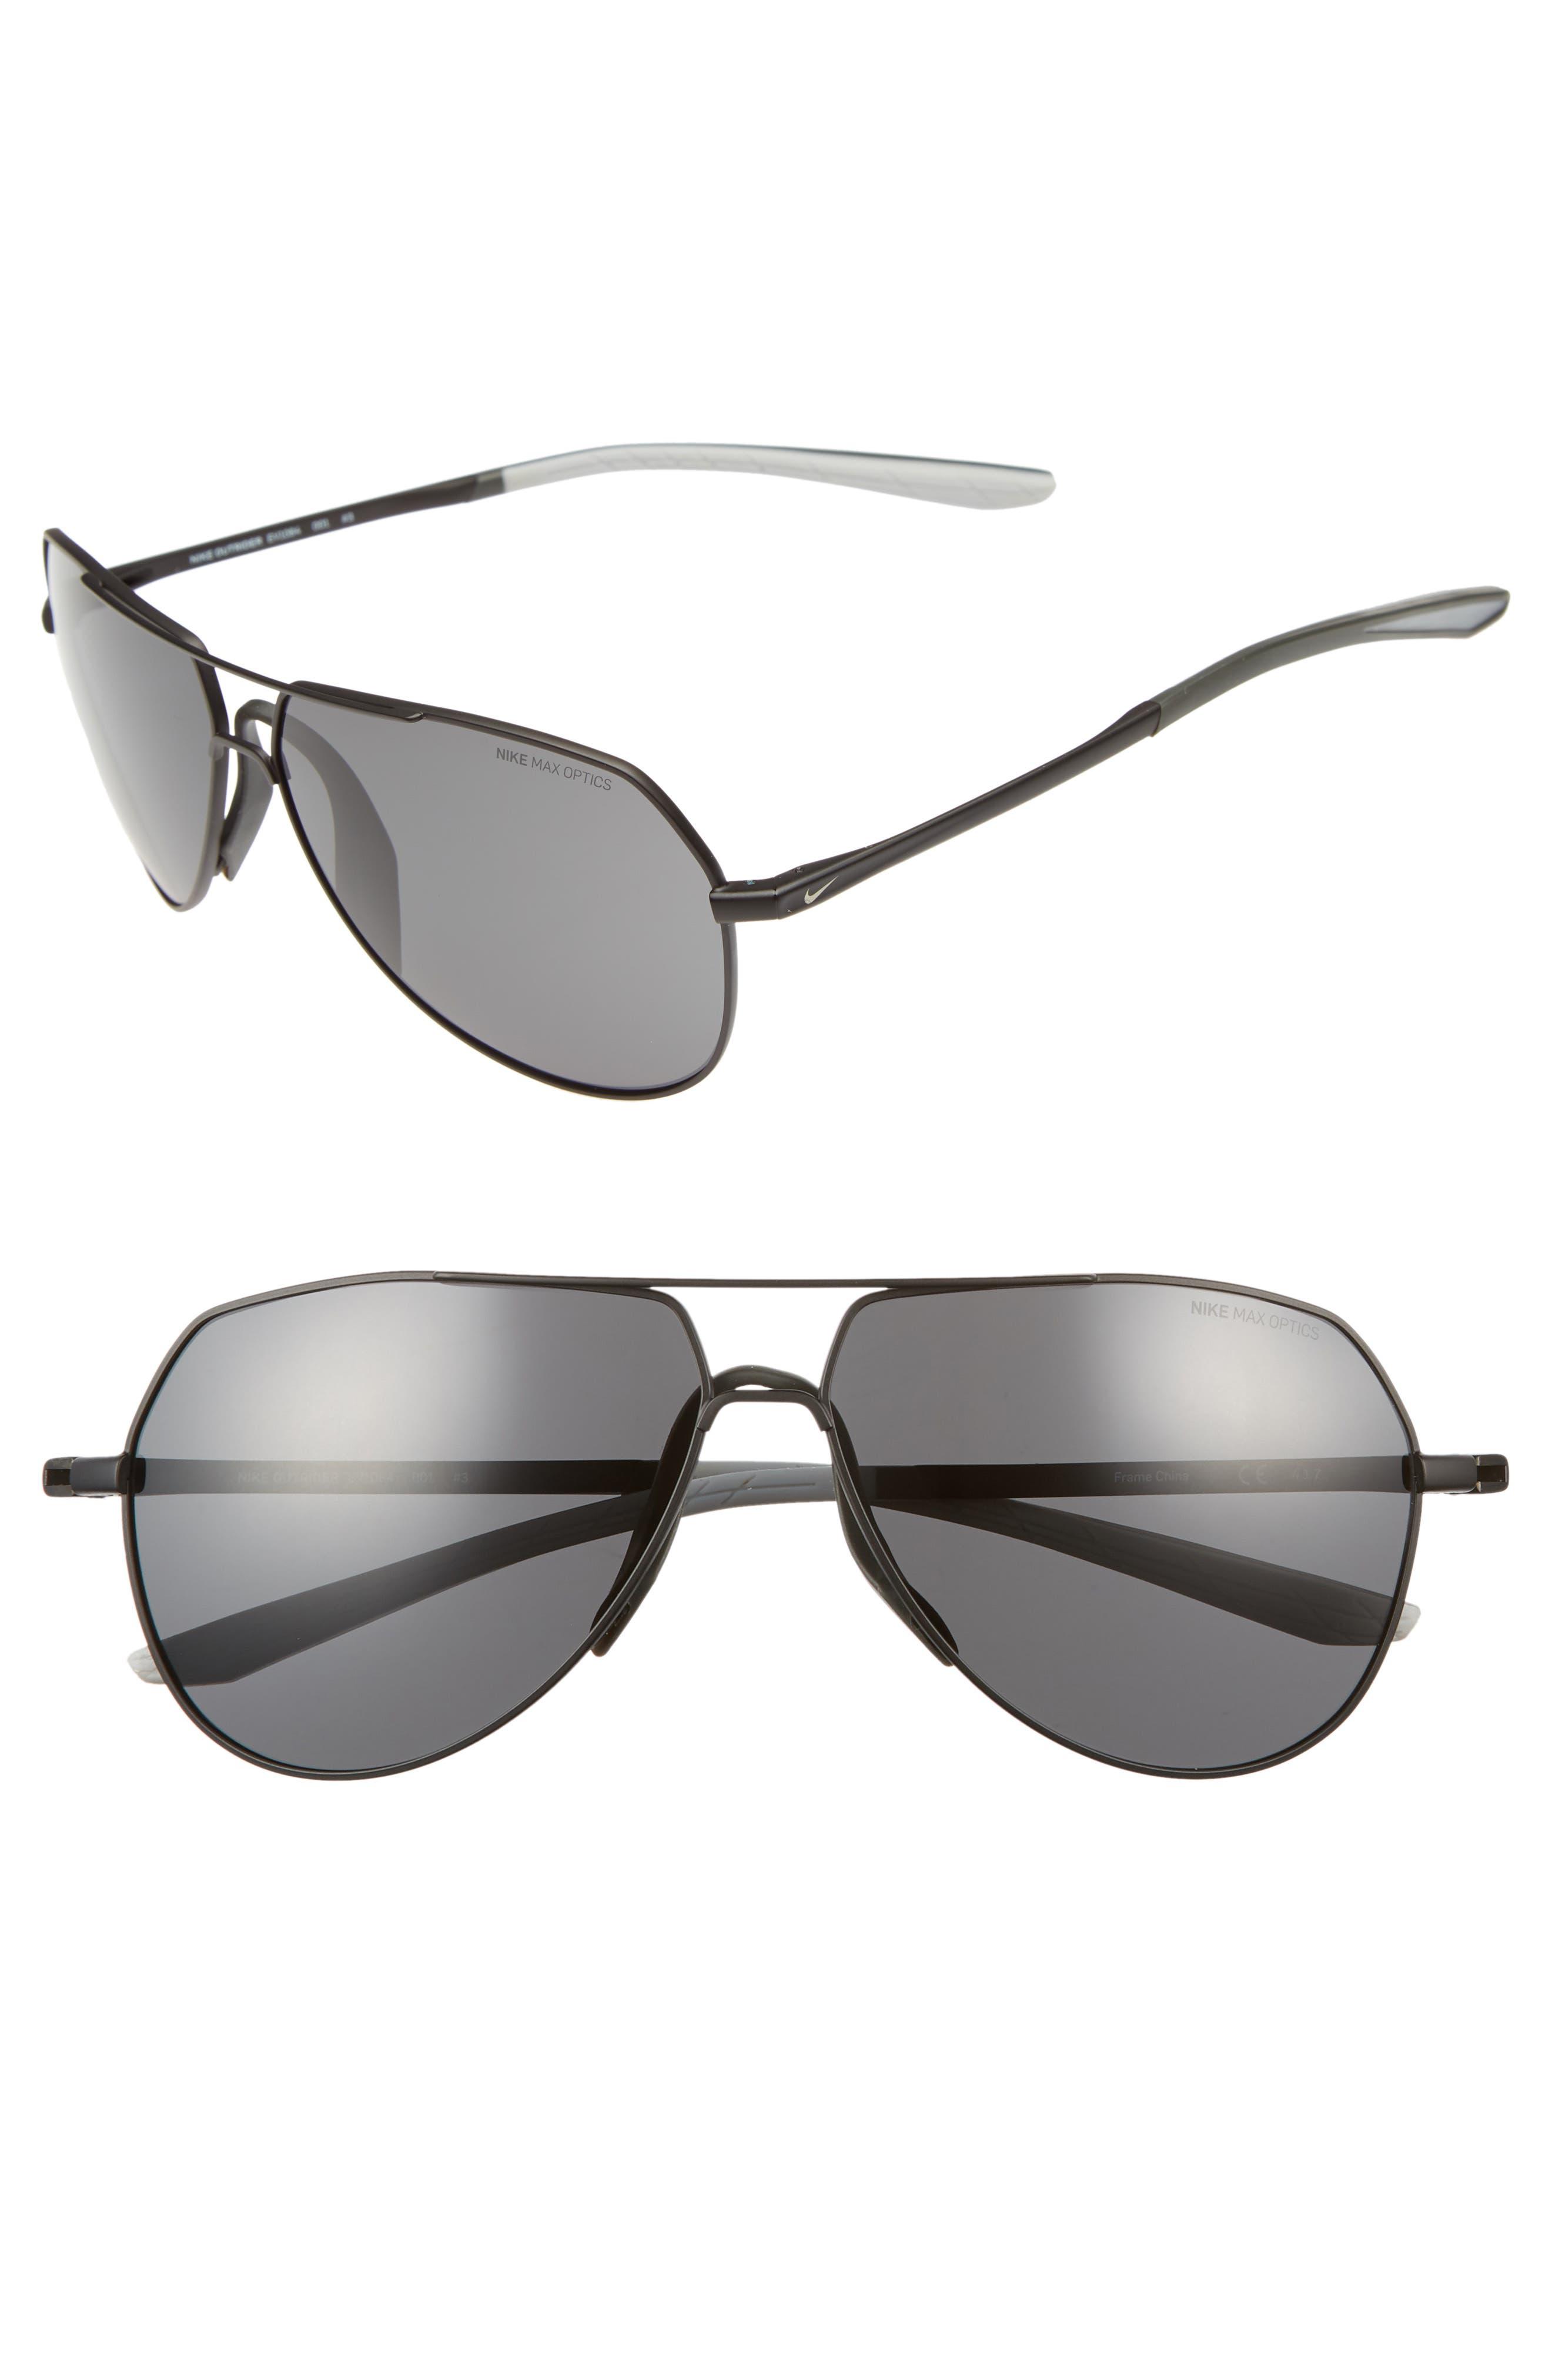 Outrider 62mm Oversize Aviator Sunglasses,                         Main,                         color, 001